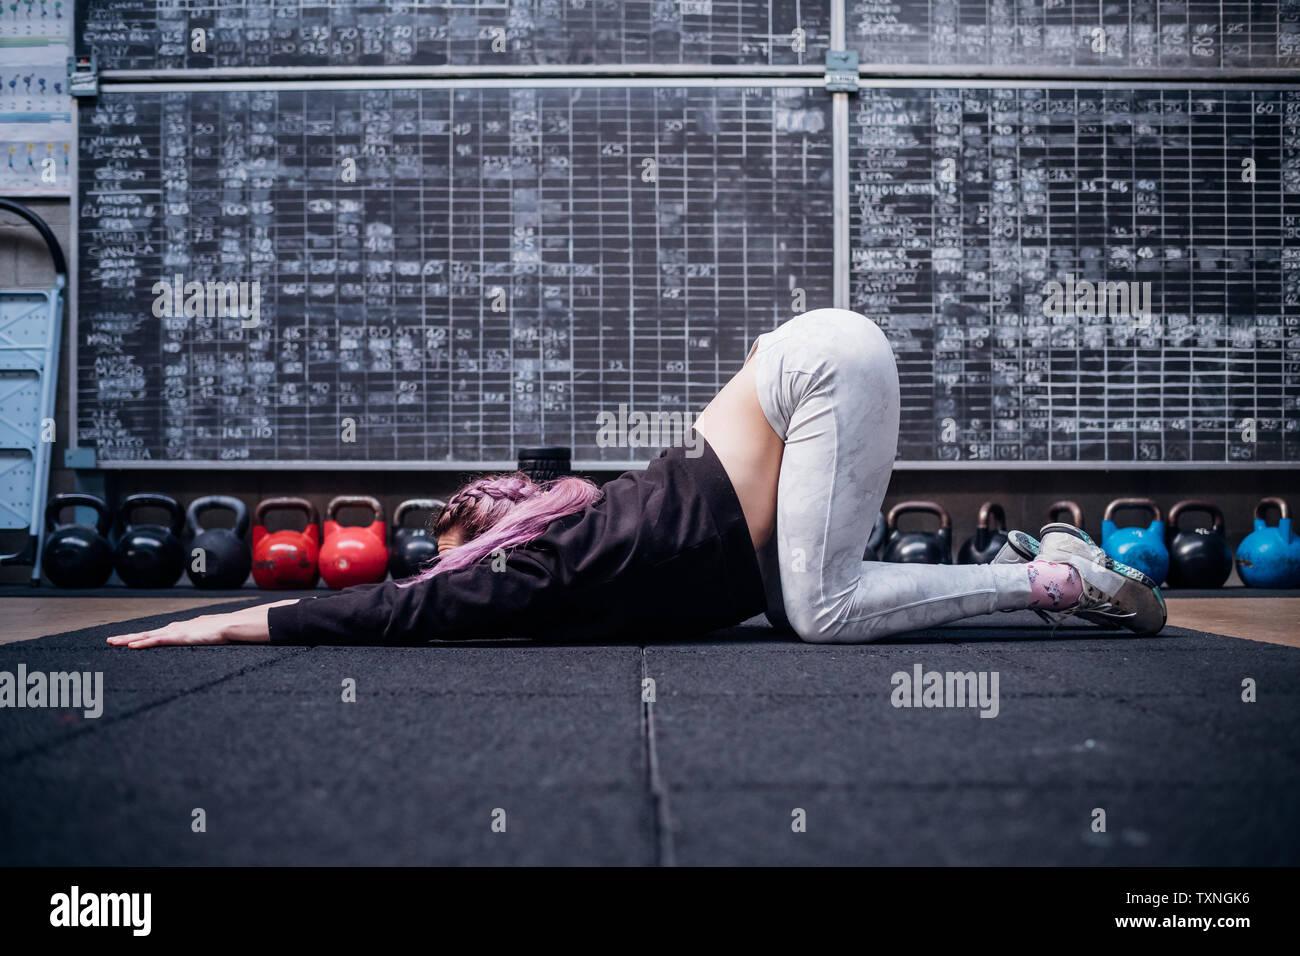 Junge Frau stretching Oberkörper in der Turnhalle Stockbild